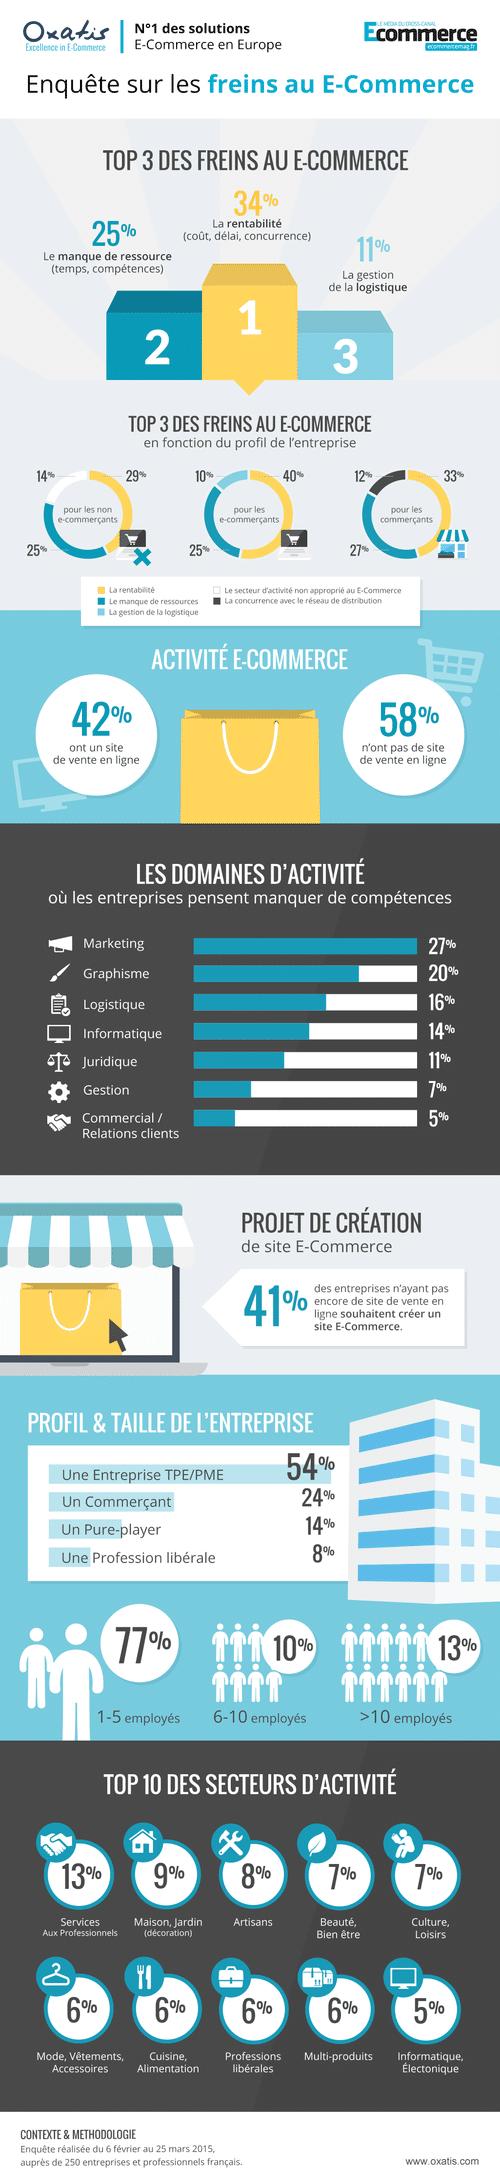 freins-e-commerce-2015